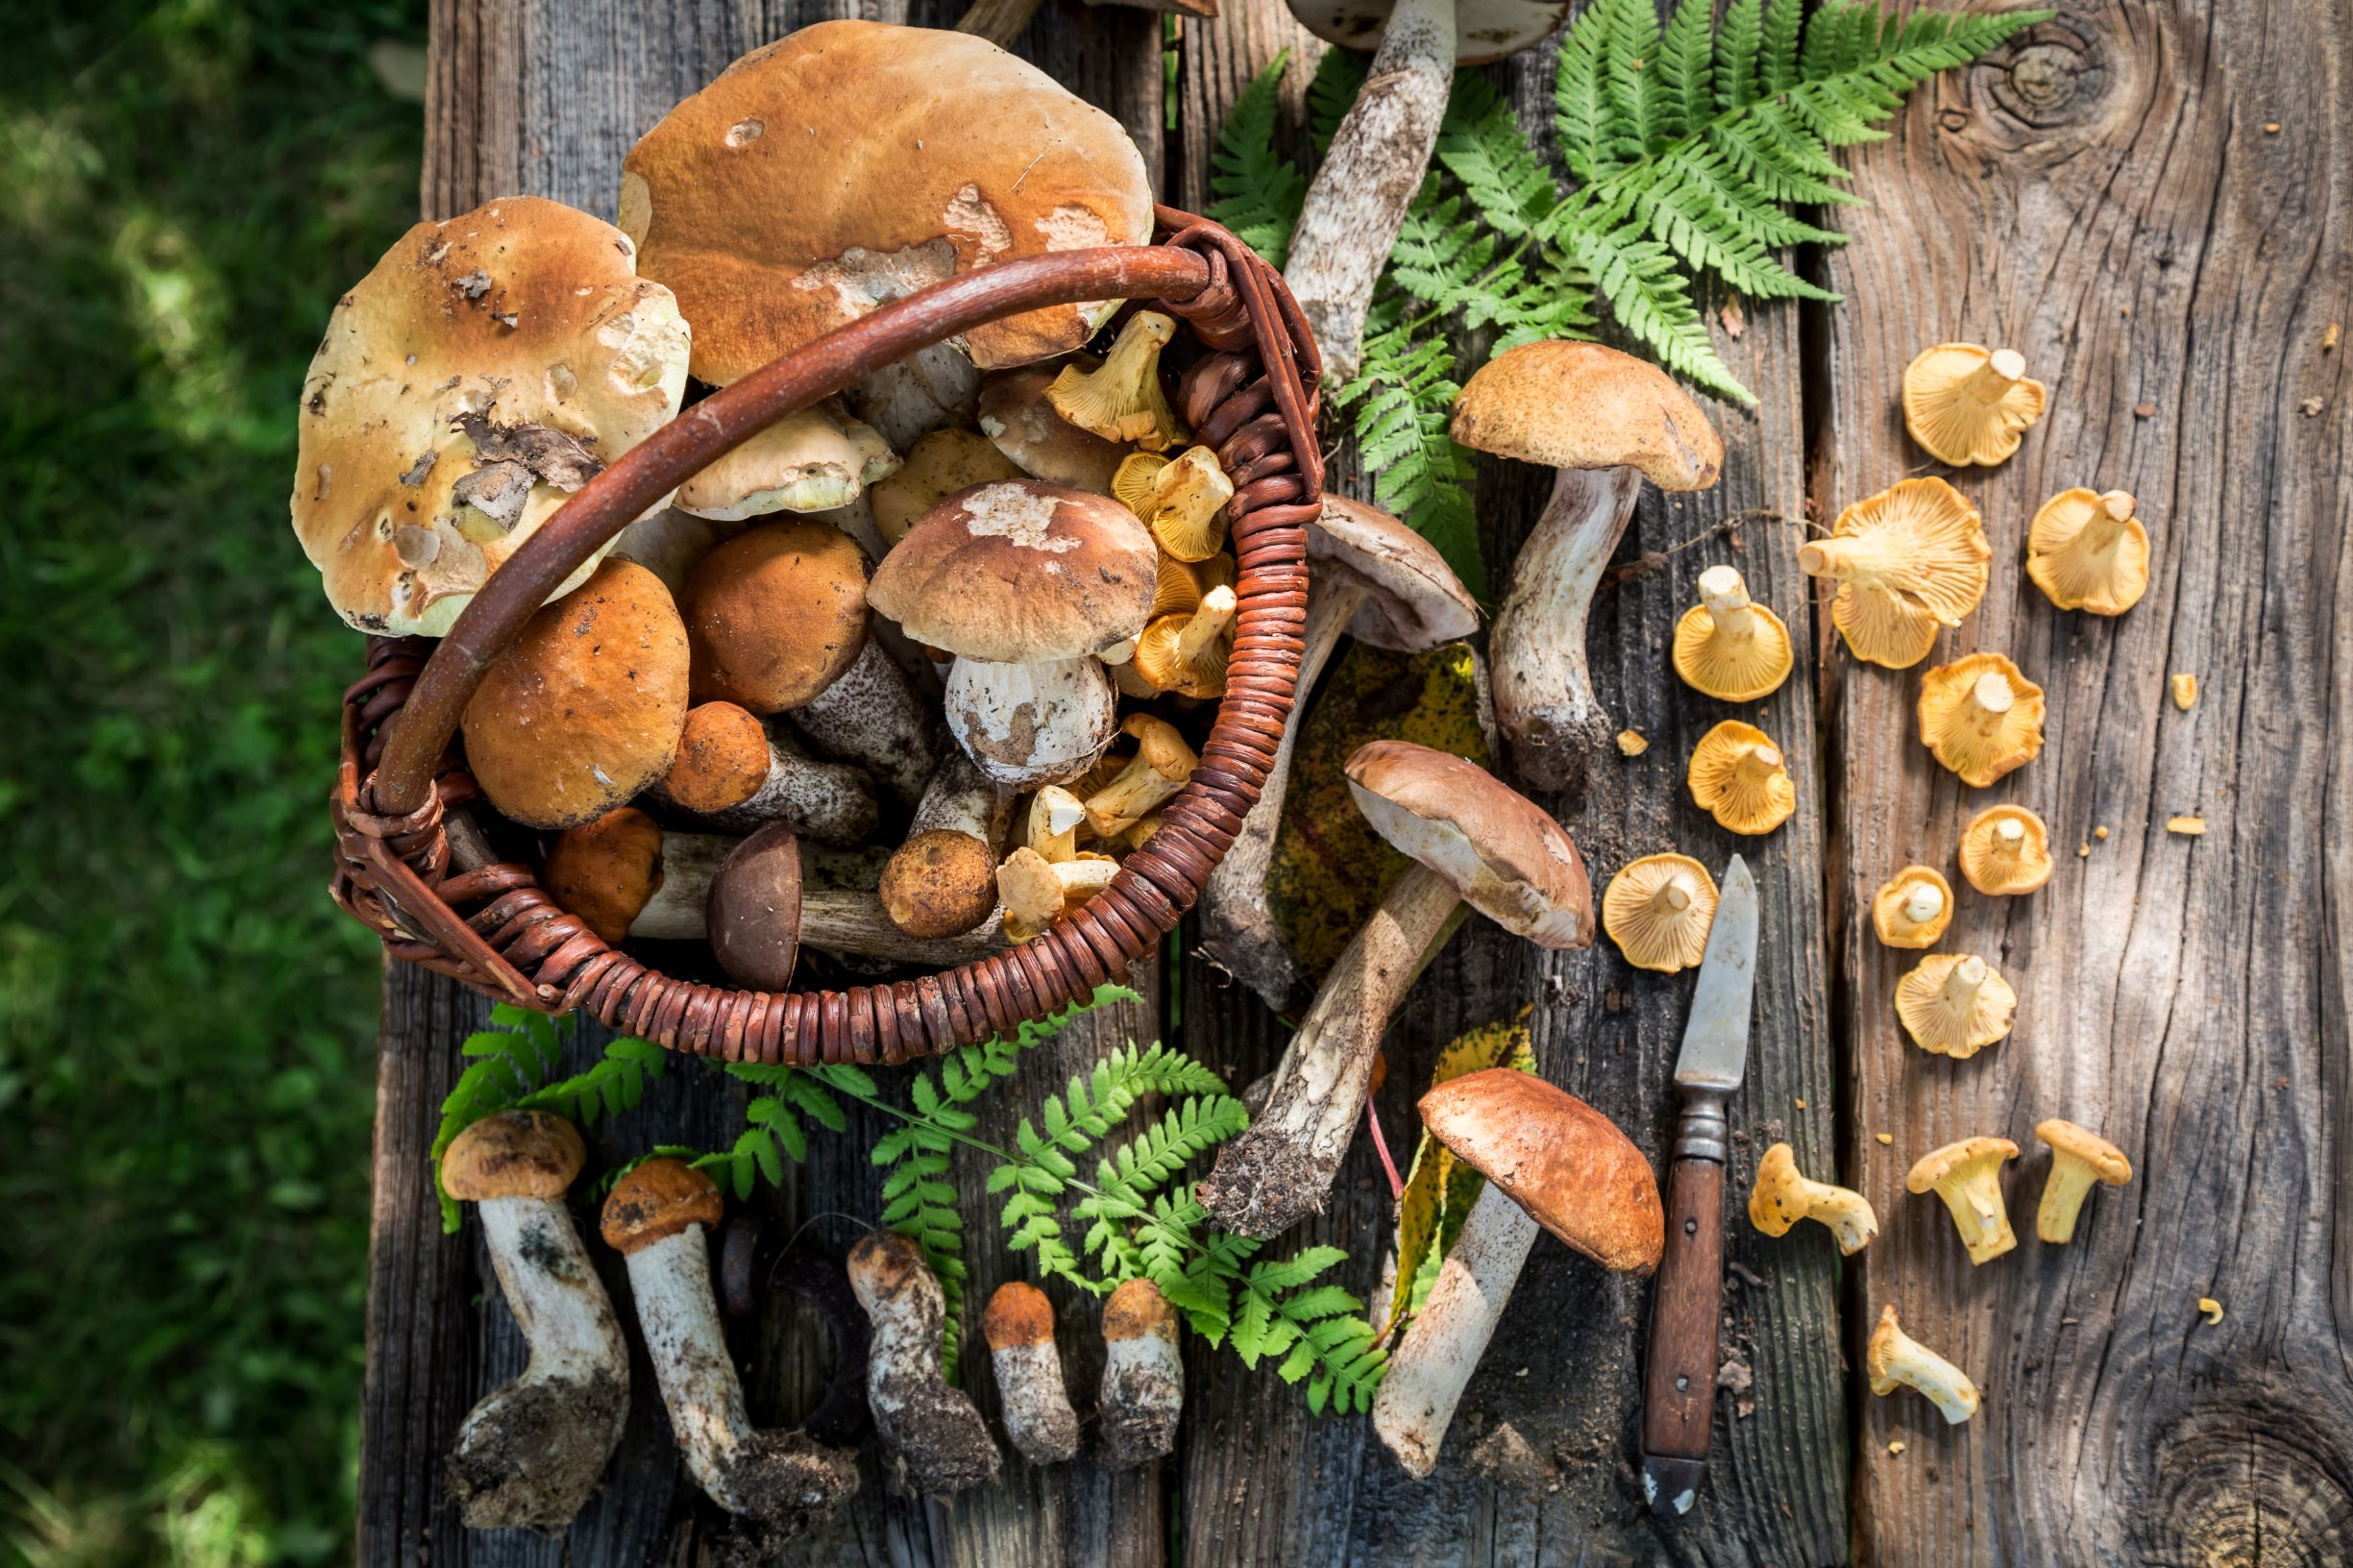 mushrooms in basket AdobeStock_169948003 smaller.jpeg